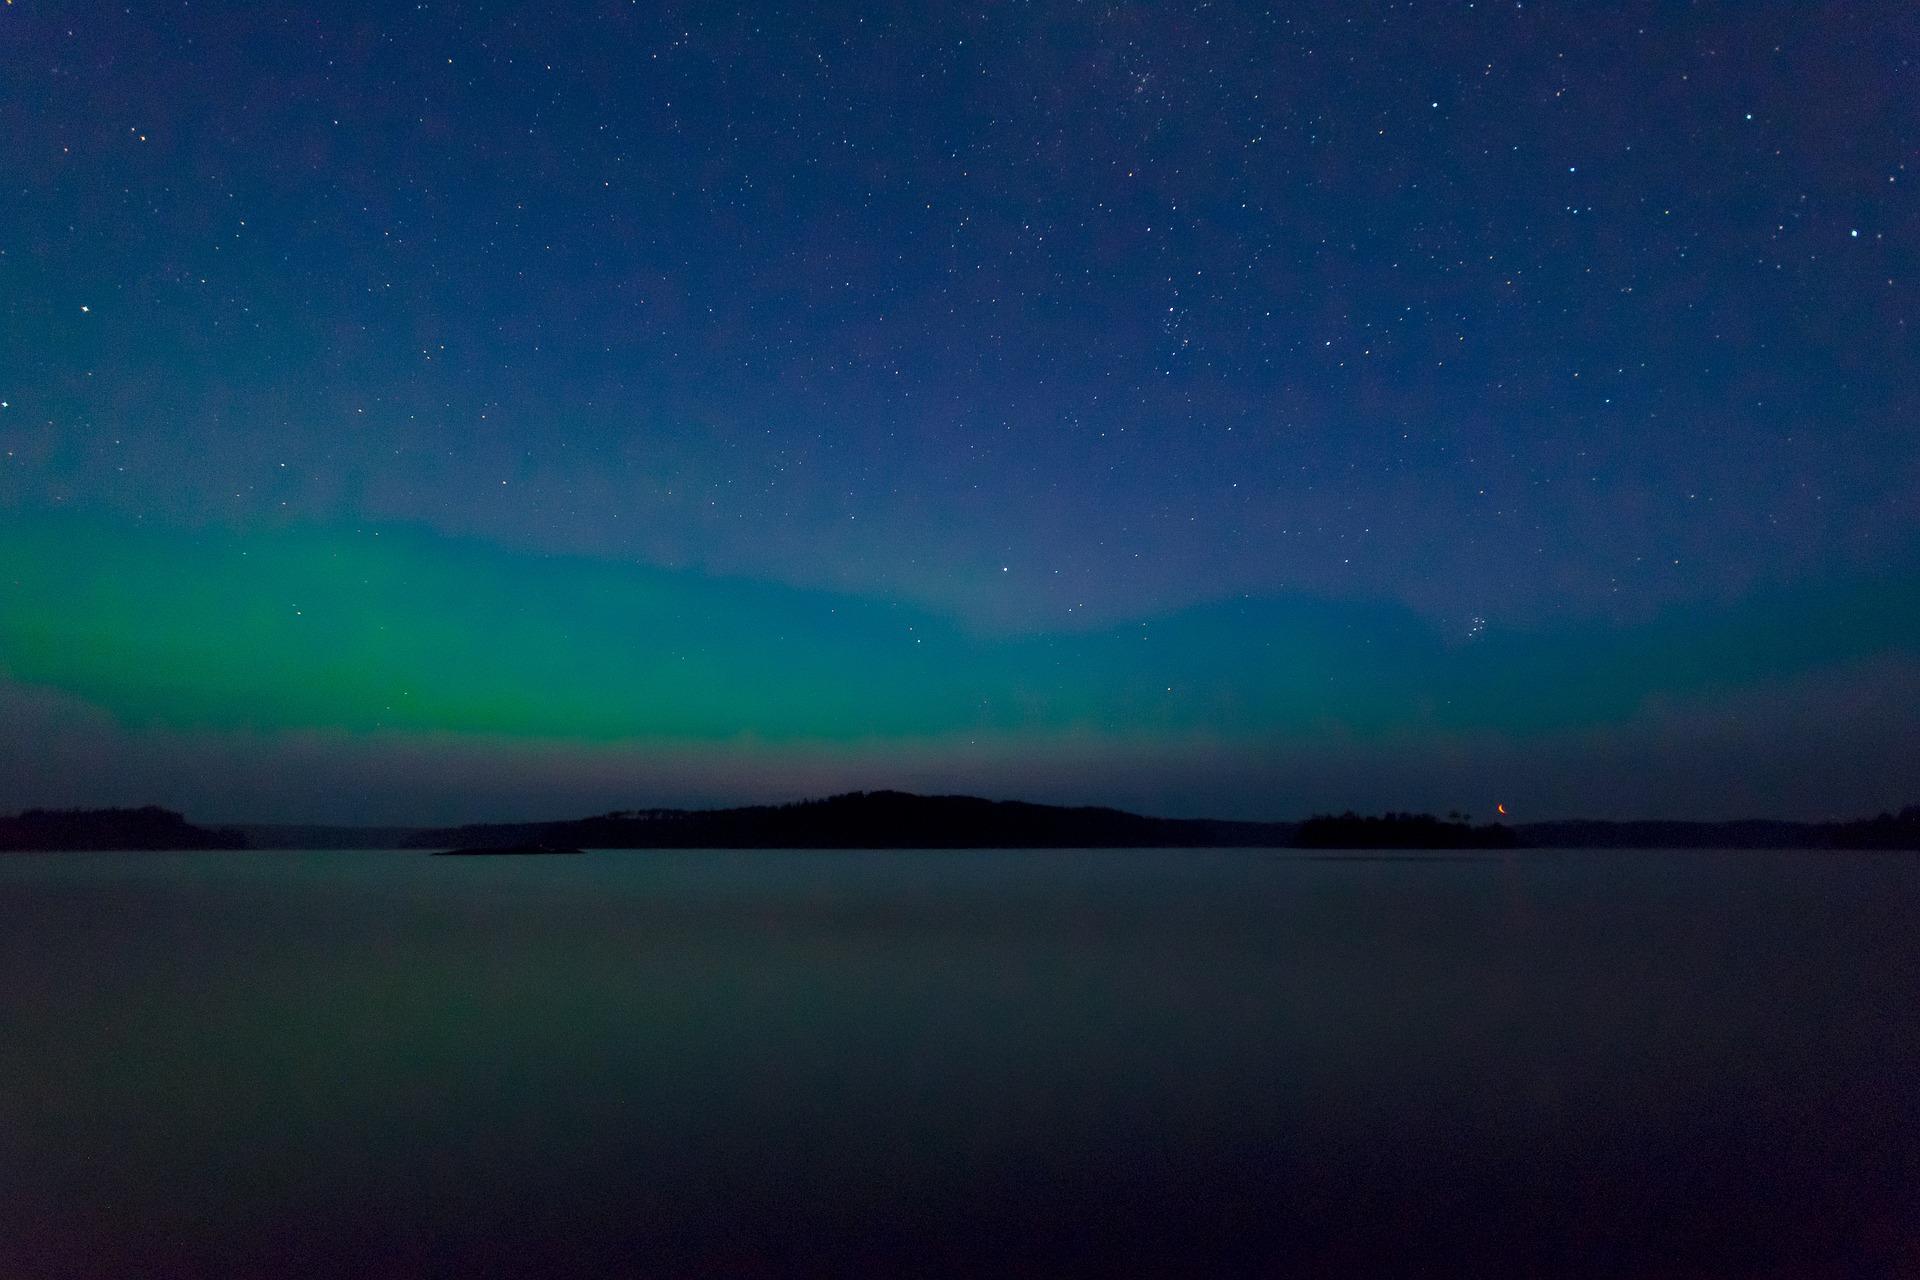 Aurora borealis appear in night's sky